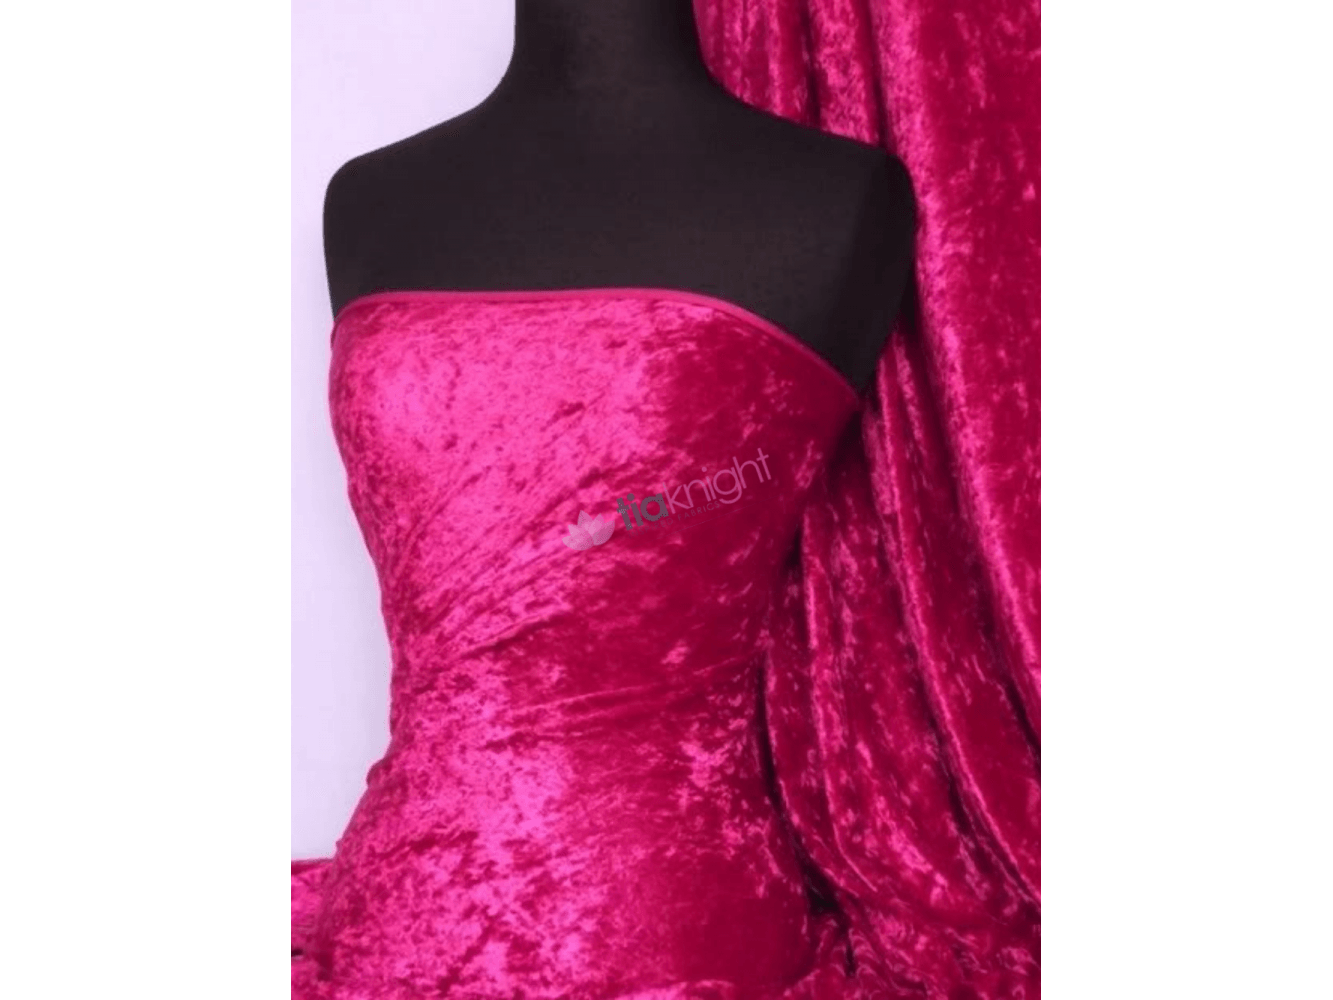 Crushed Velvet/Velour Stretch Material- Red Q156 RD